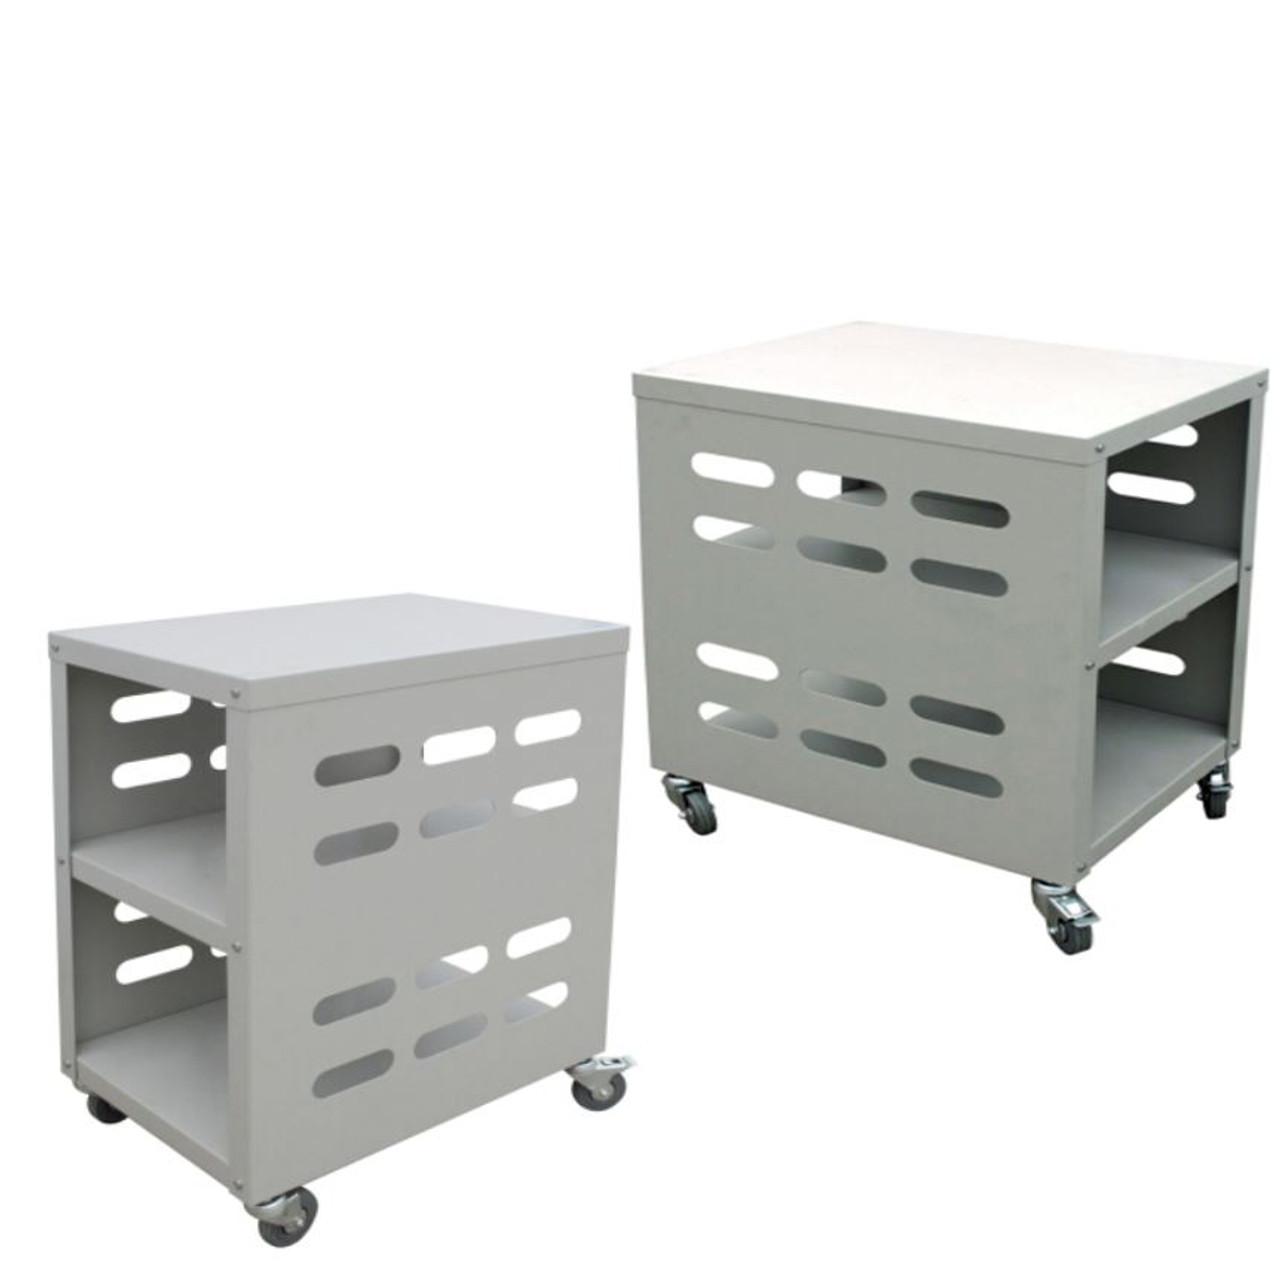 Heavy Duty Workstation Table for Franking / Folding Machines & Folder Inserters